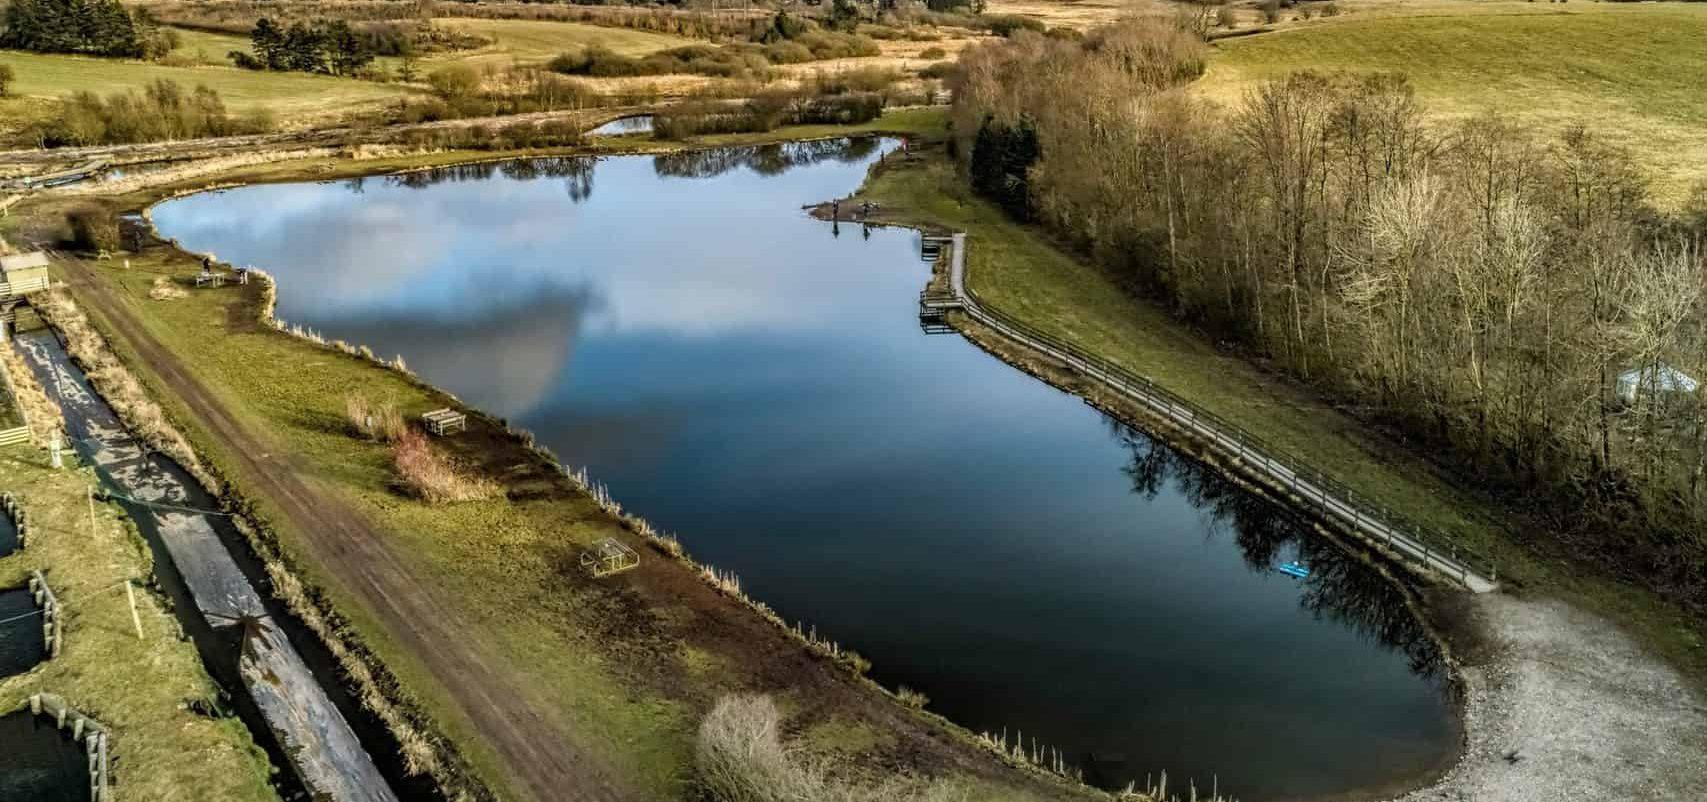 Munkbro Fiskesø og dambrug